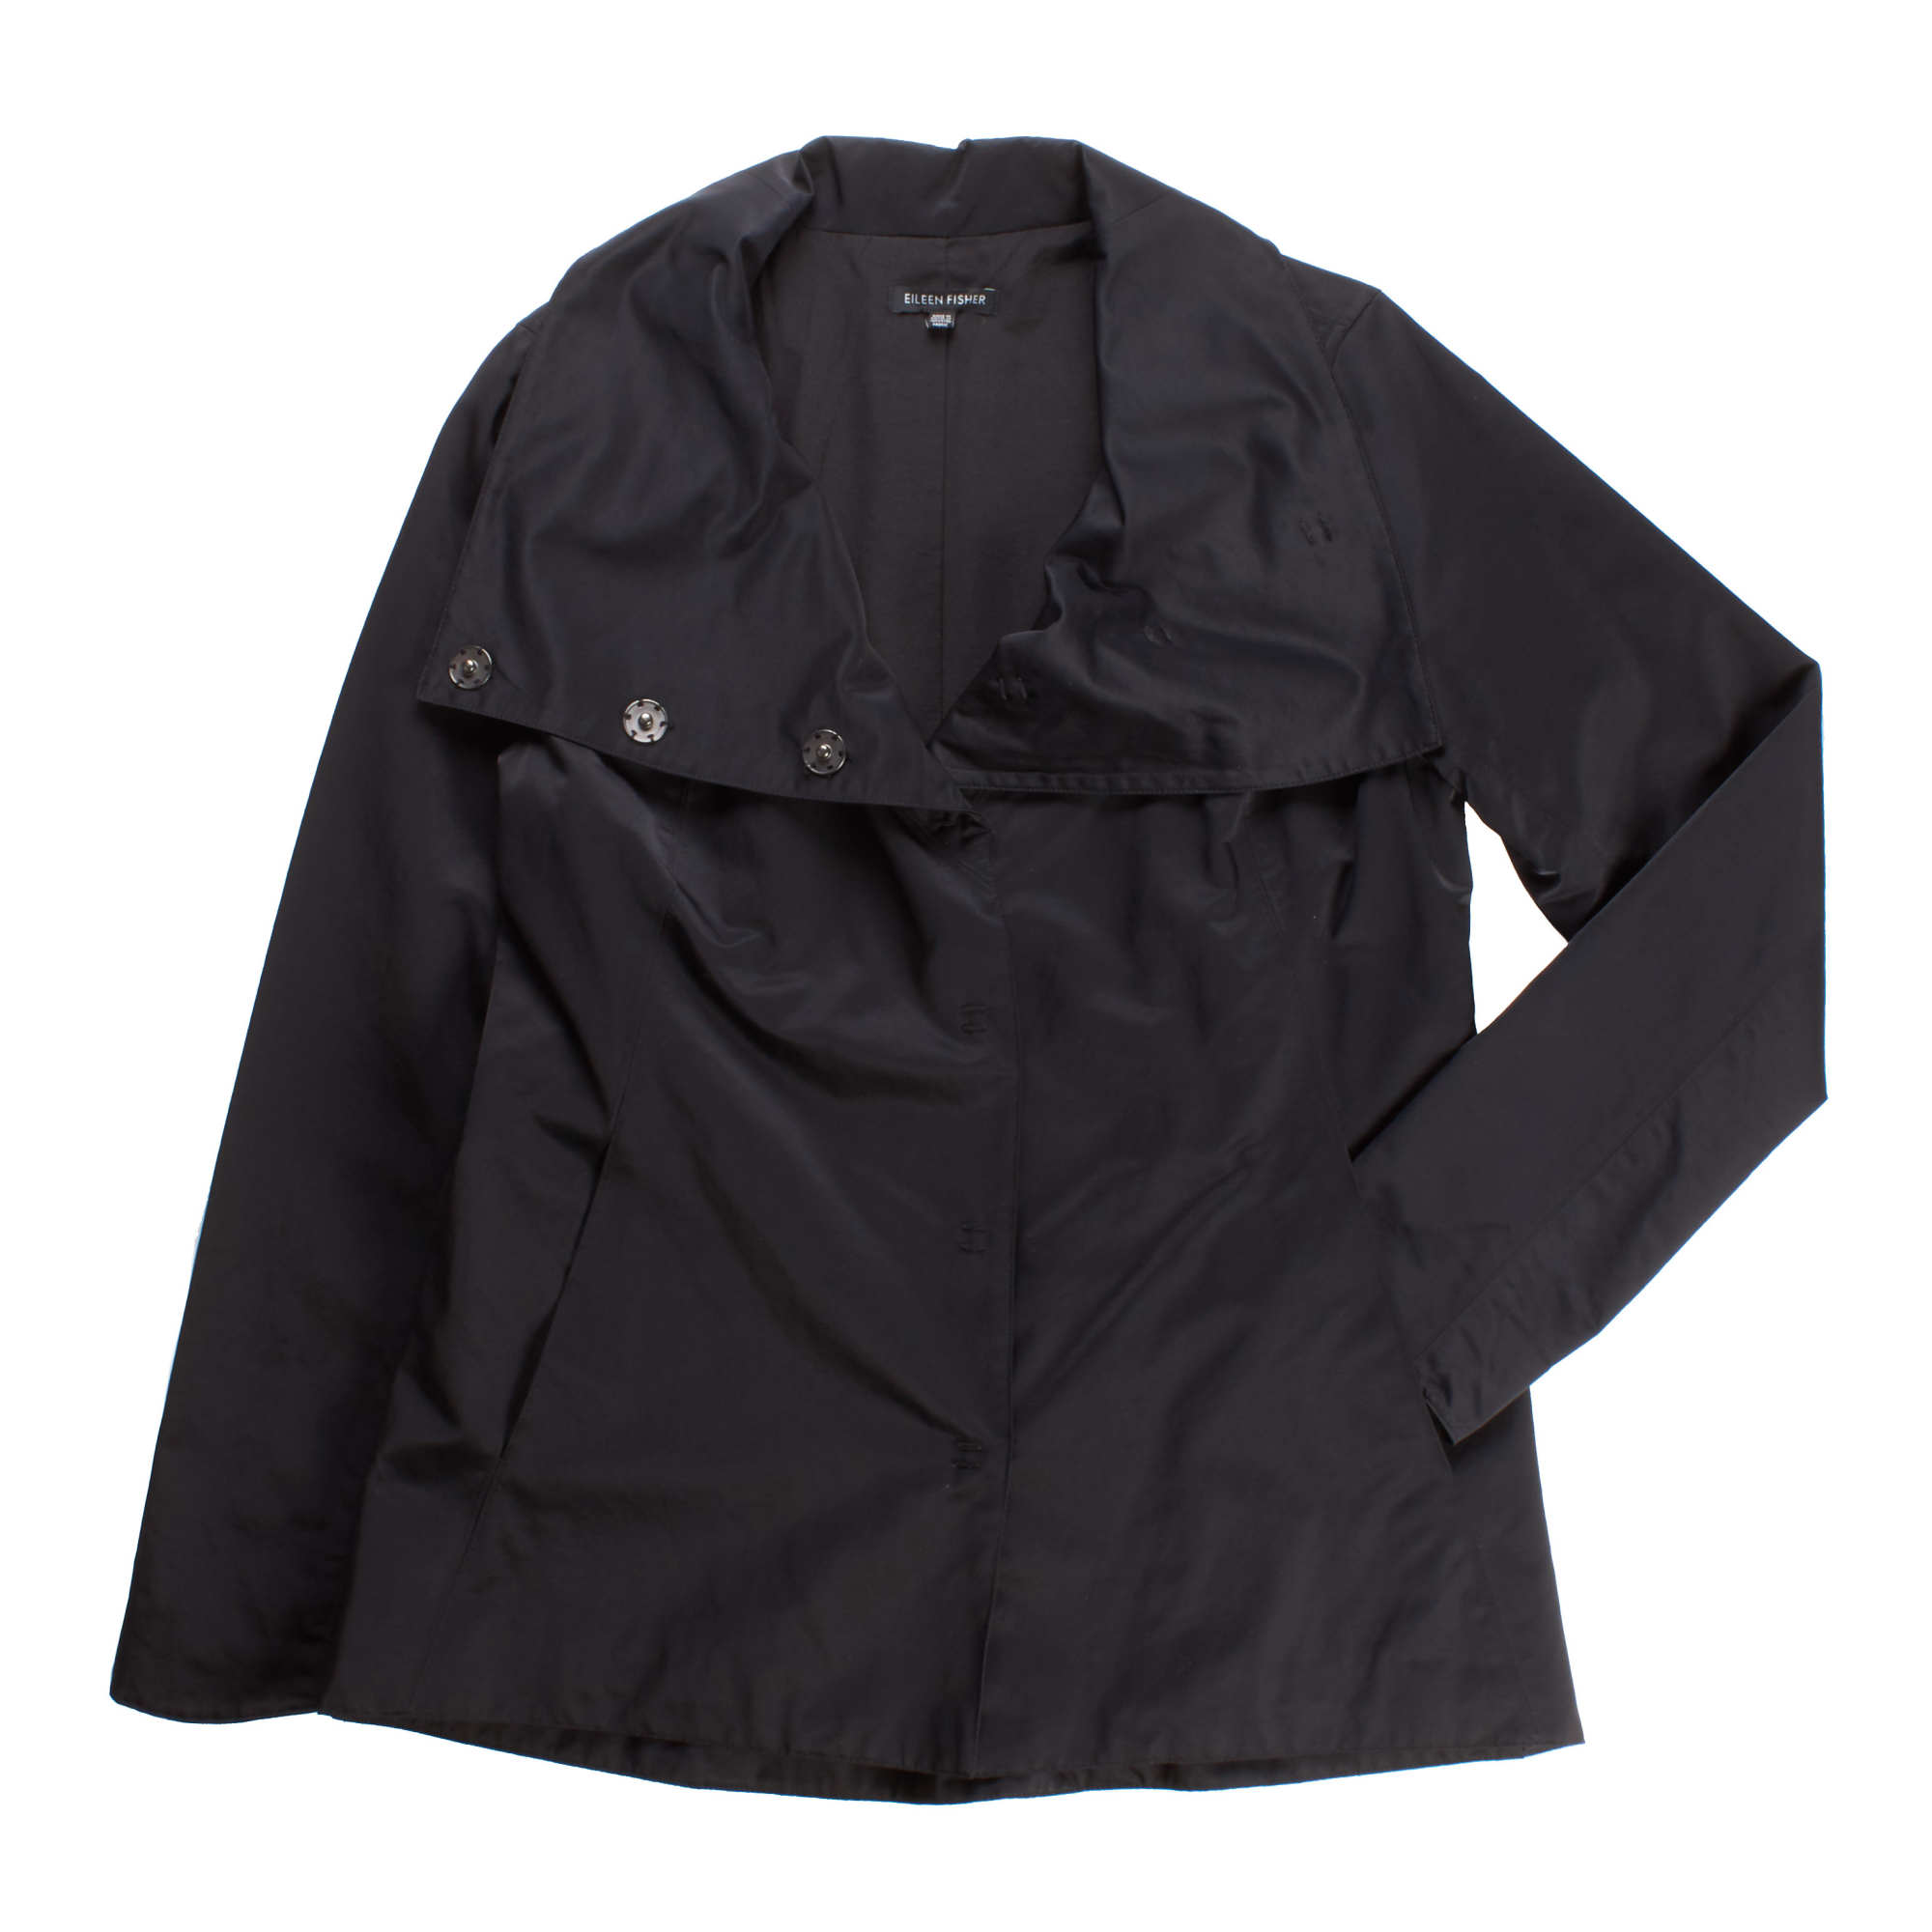 Cotton Nylon W/cotton Lining Jacket